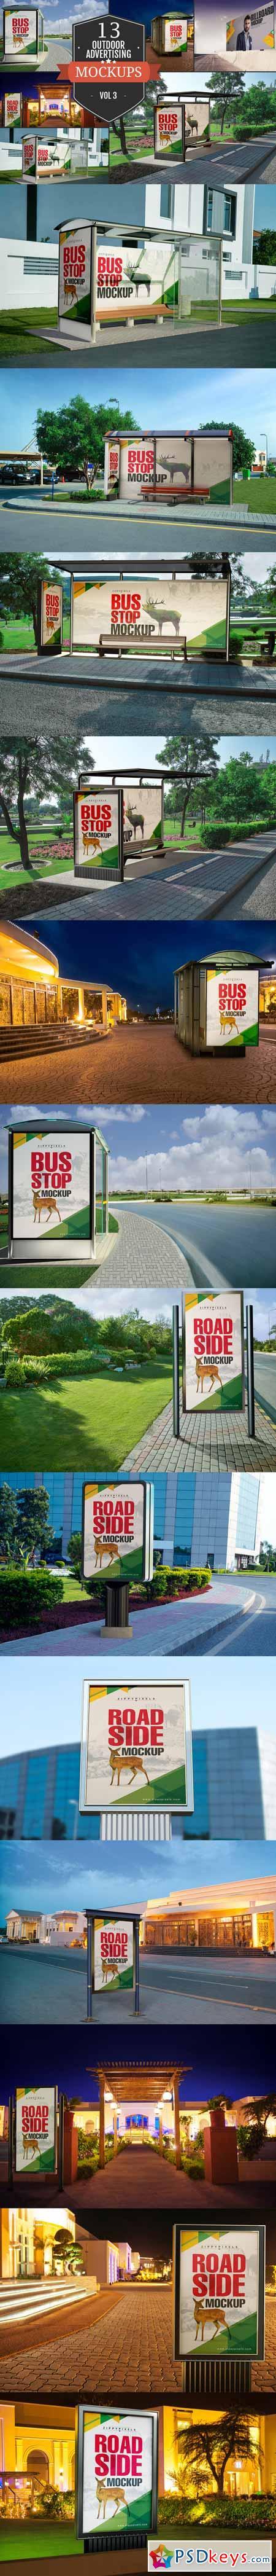 Outdoor Advertising Mockups Vol. 3 371857